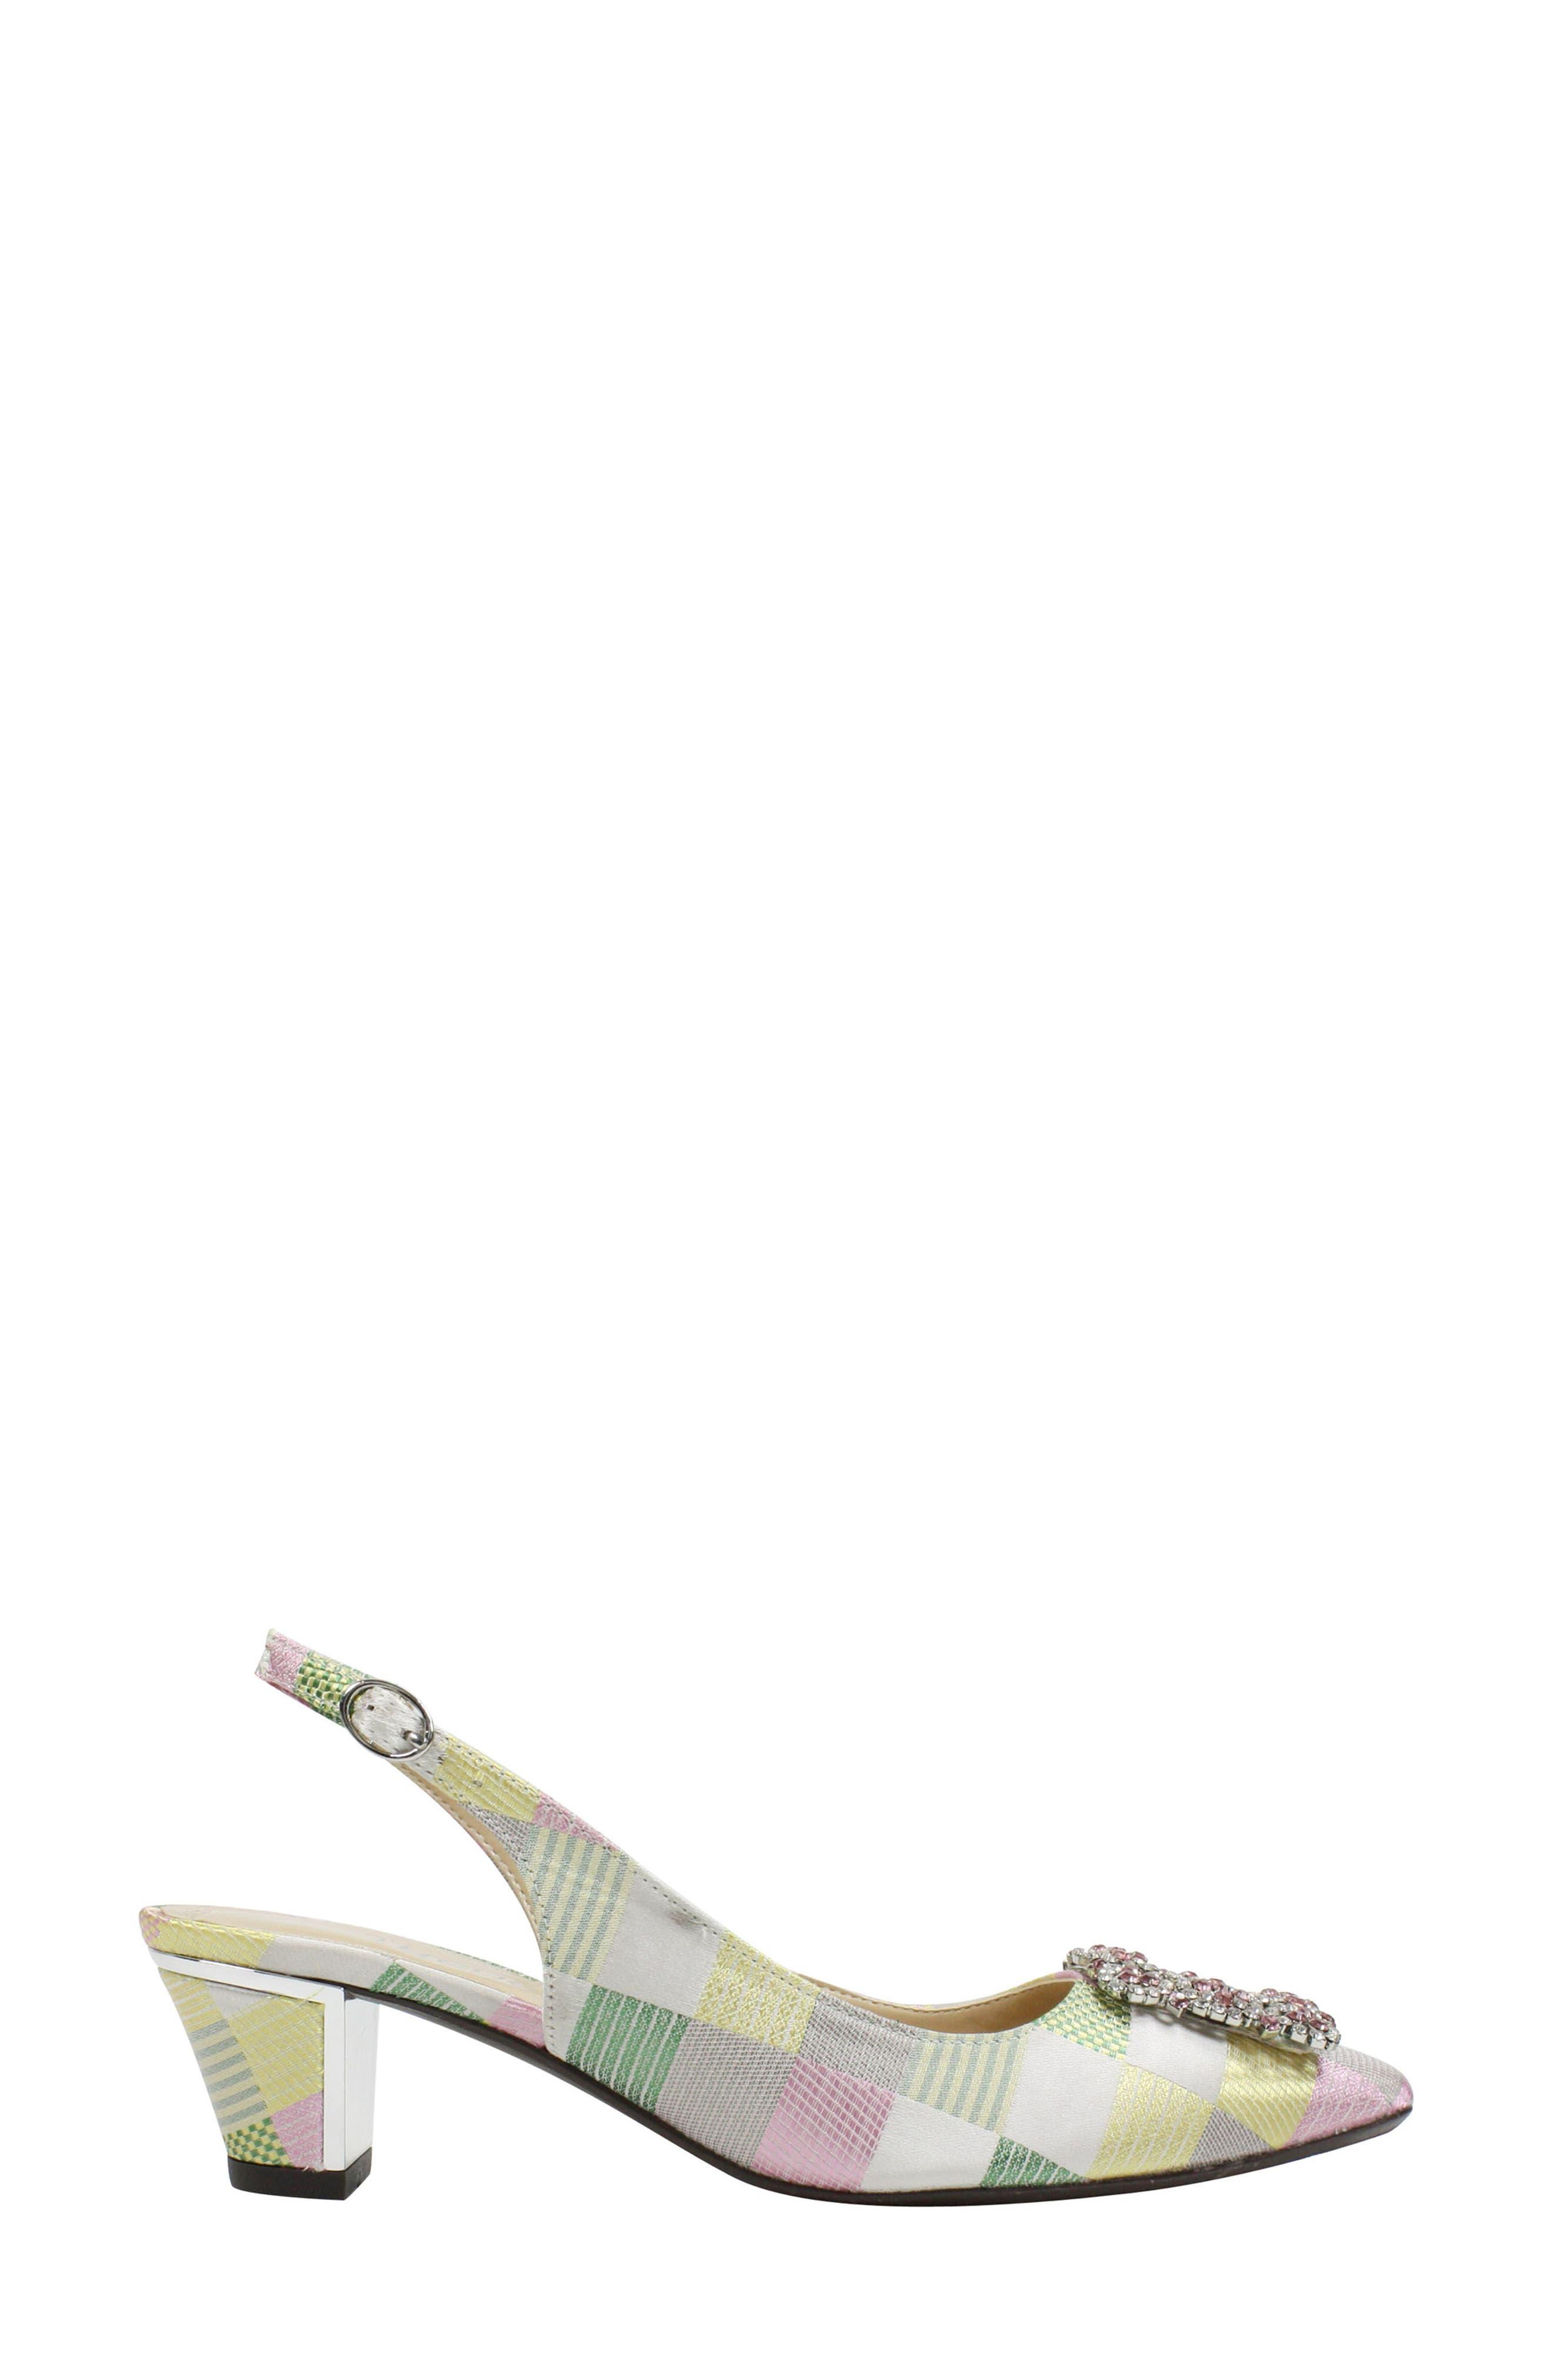 Charee Slingback Pump,                             Alternate thumbnail 3, color,                             650